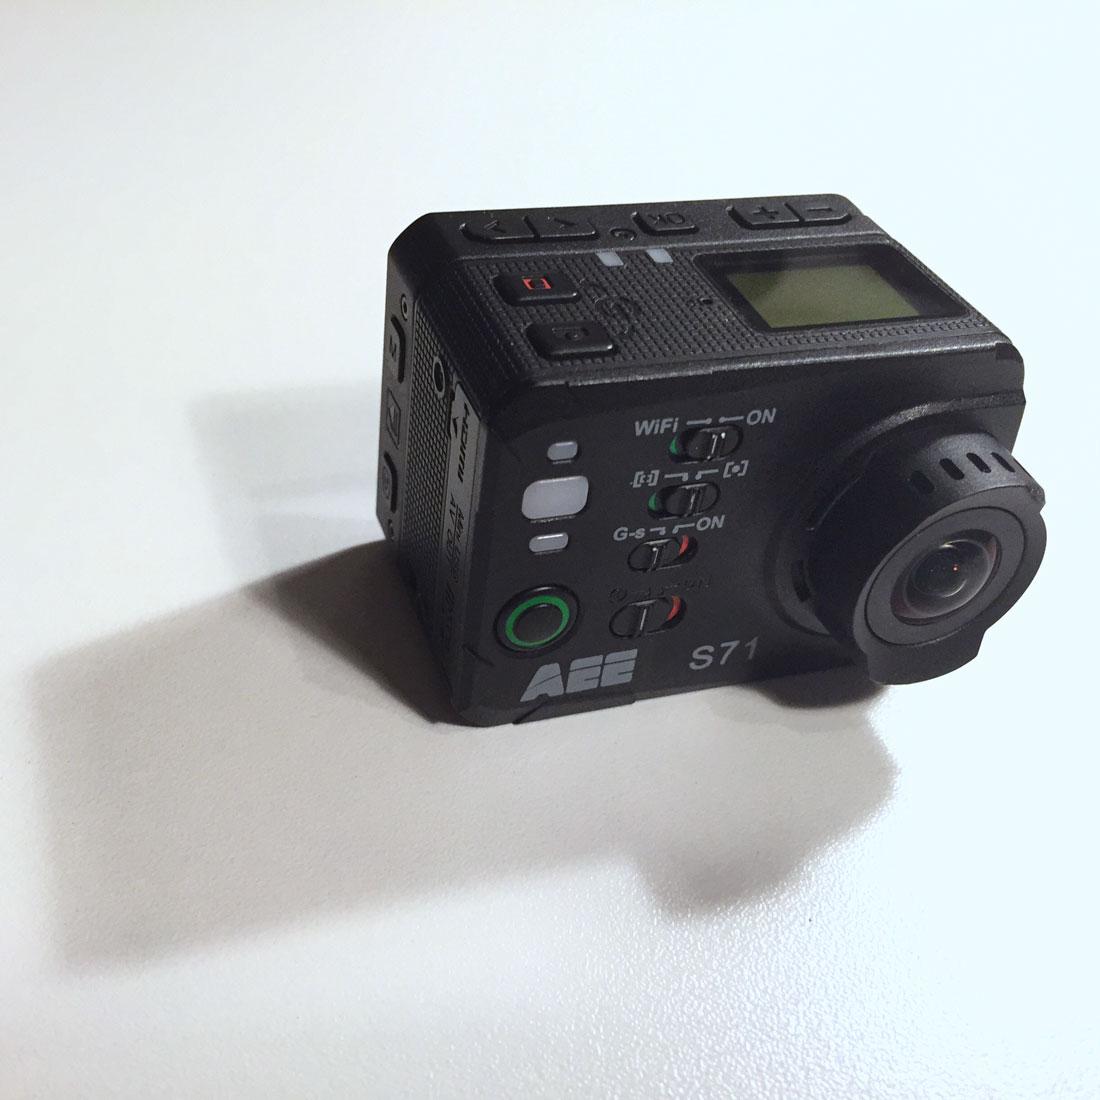 La caméra d'action PNJ AEE S71, 2014, Ph. Moctar KANE.